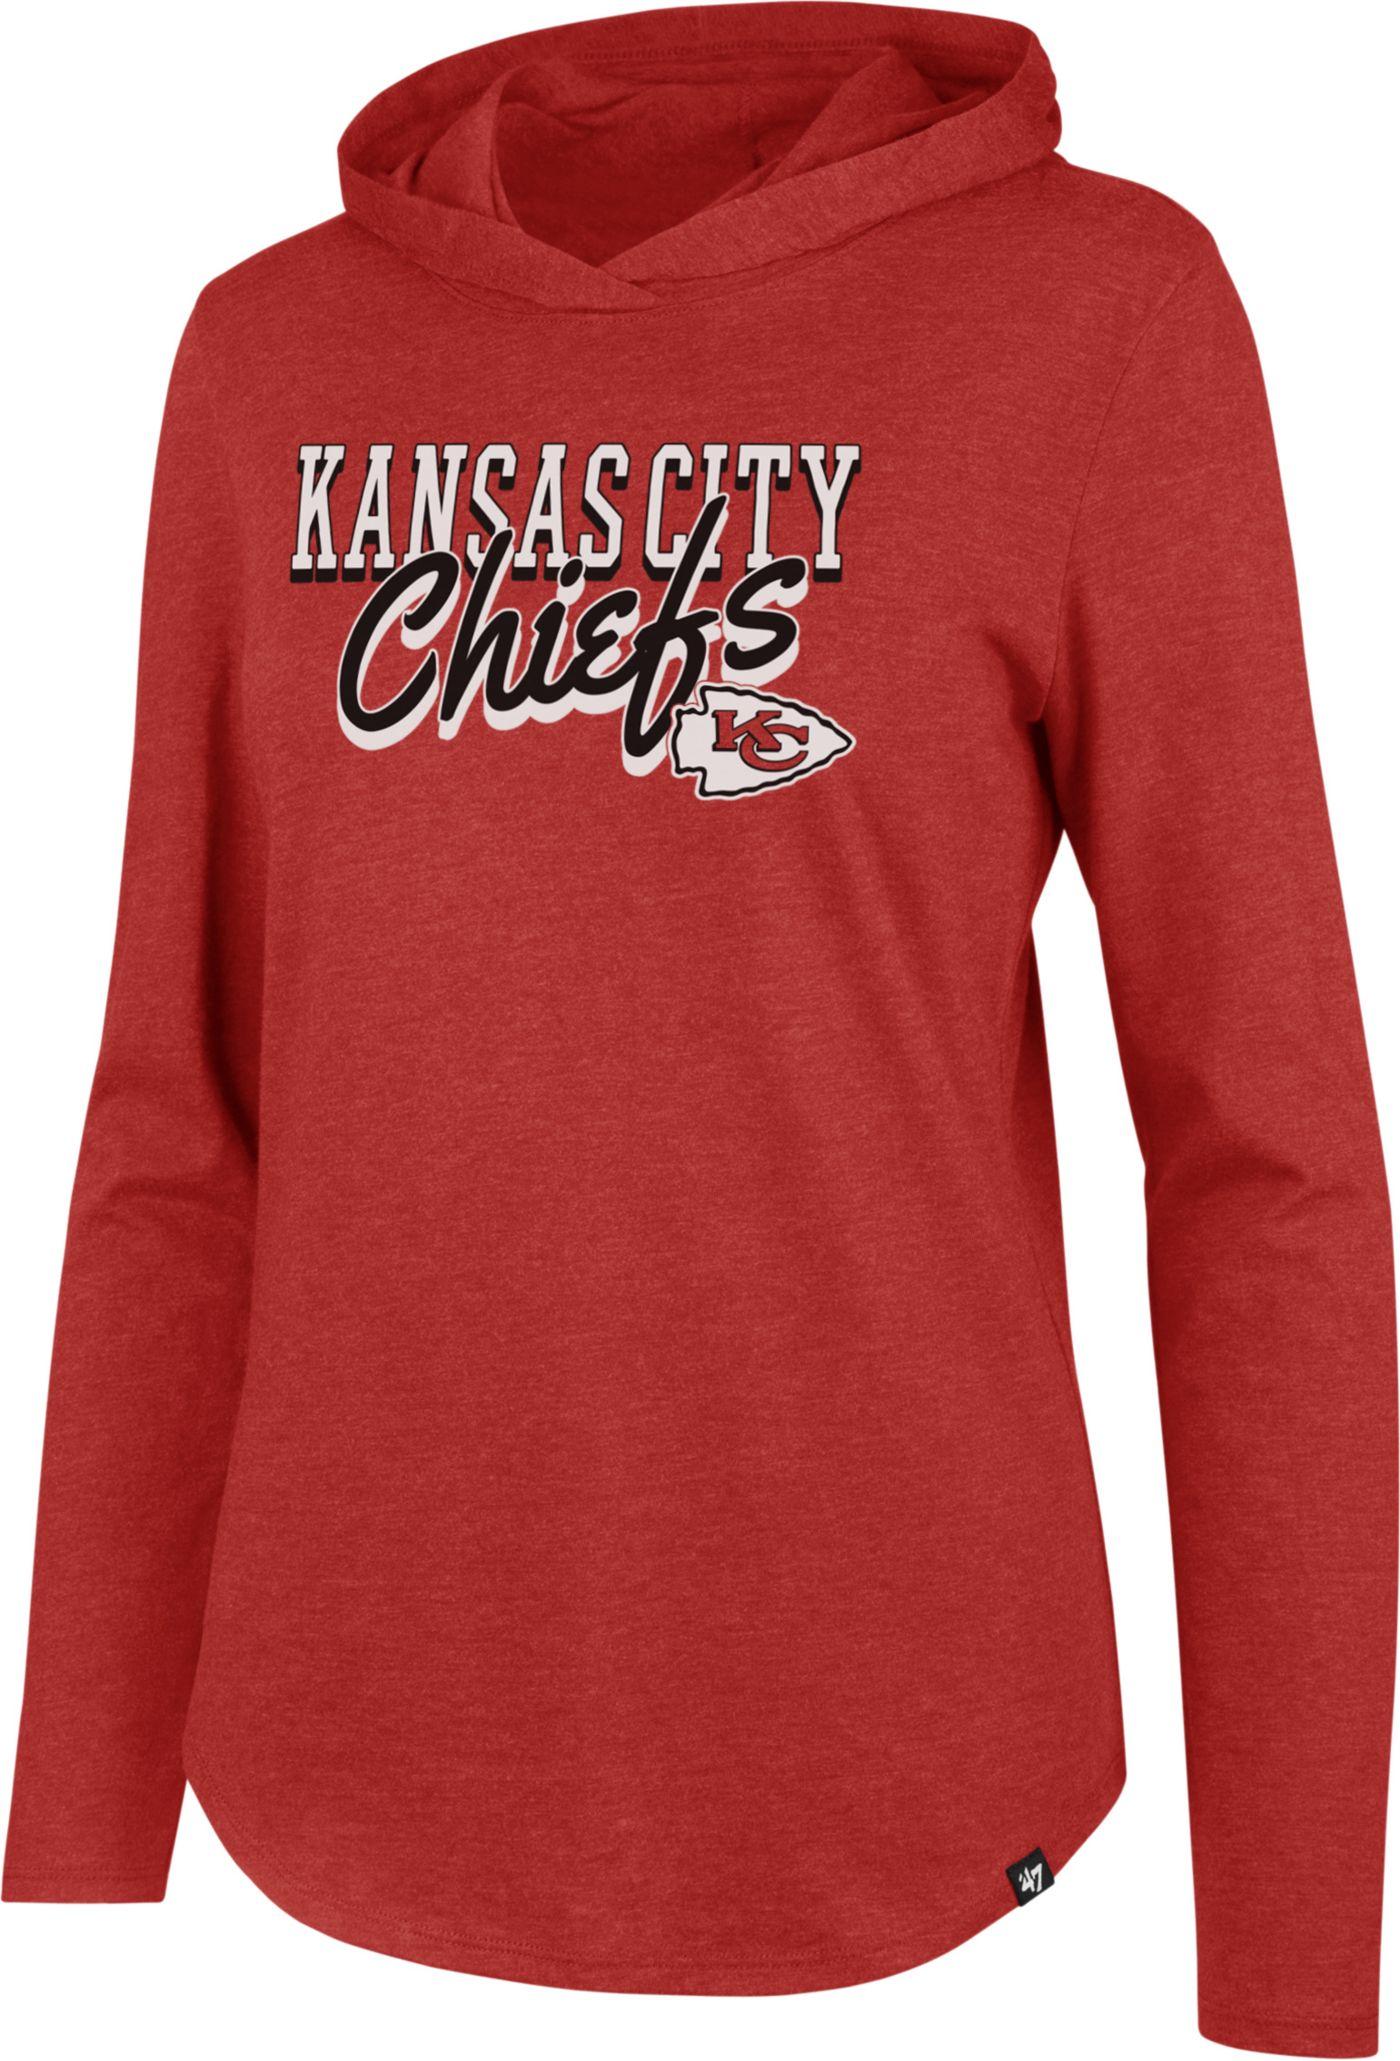 '47 Women's Kansas City Chiefs Club Red Hooded Long Sleeve Shirt